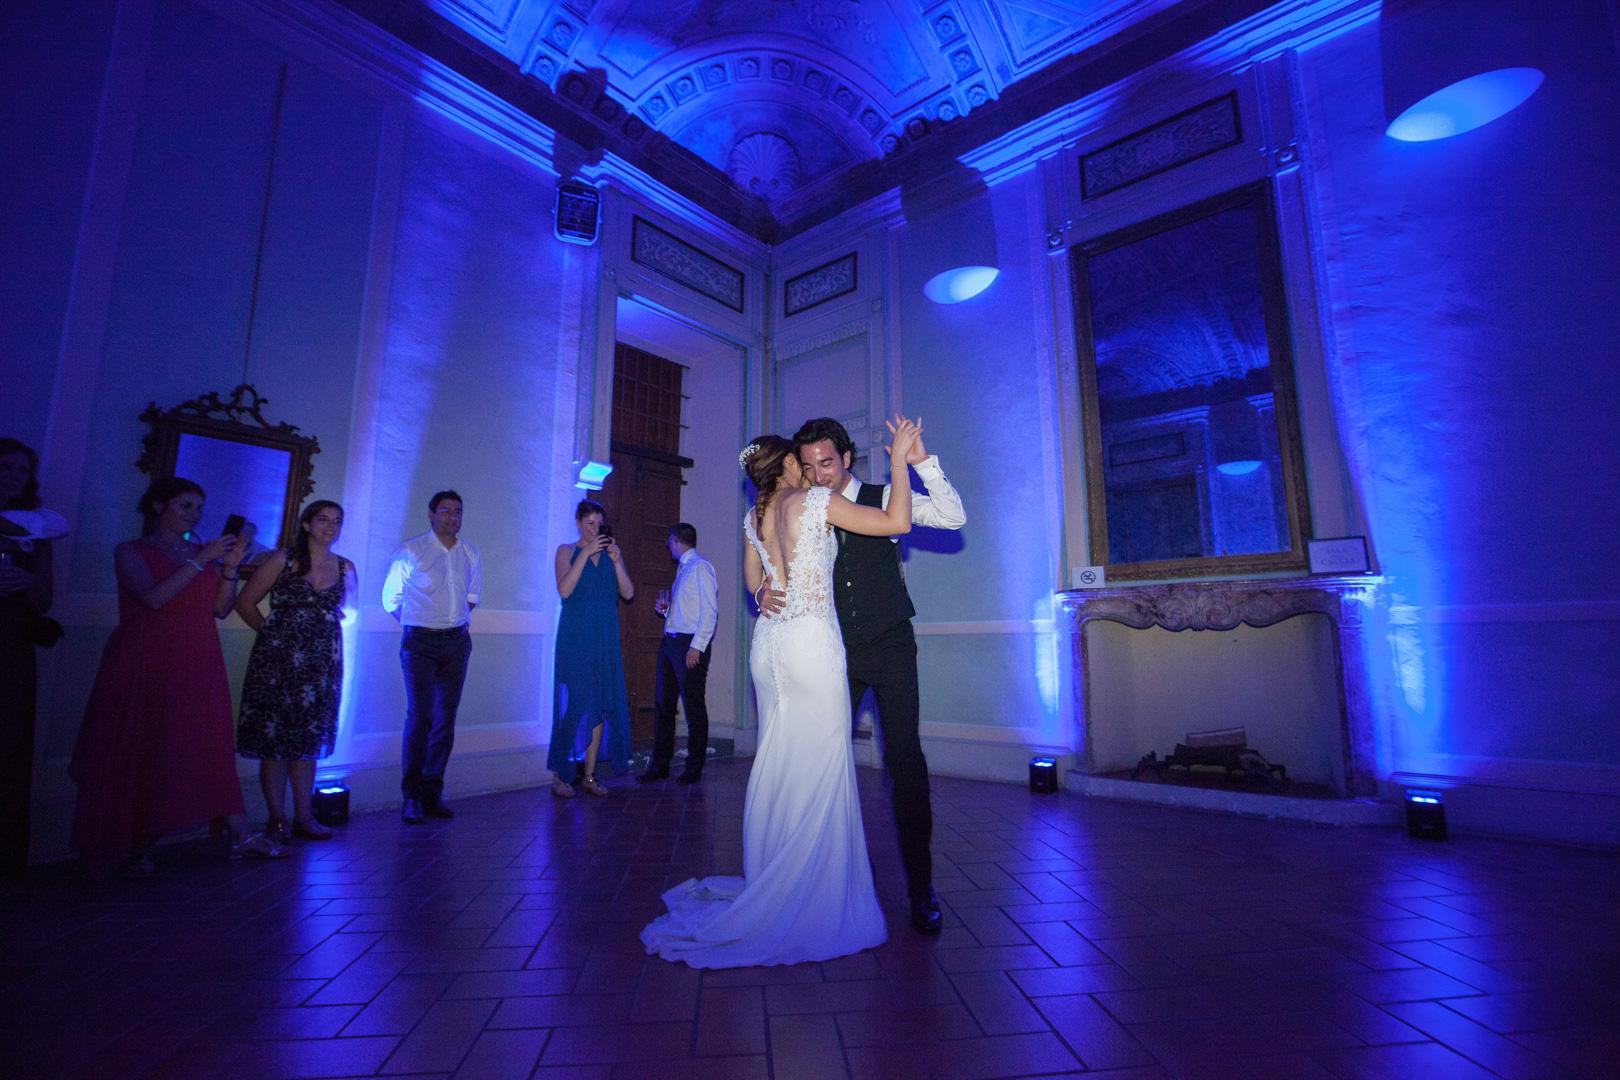 Andreas_Pinacci_Wedding_Photographer-43.